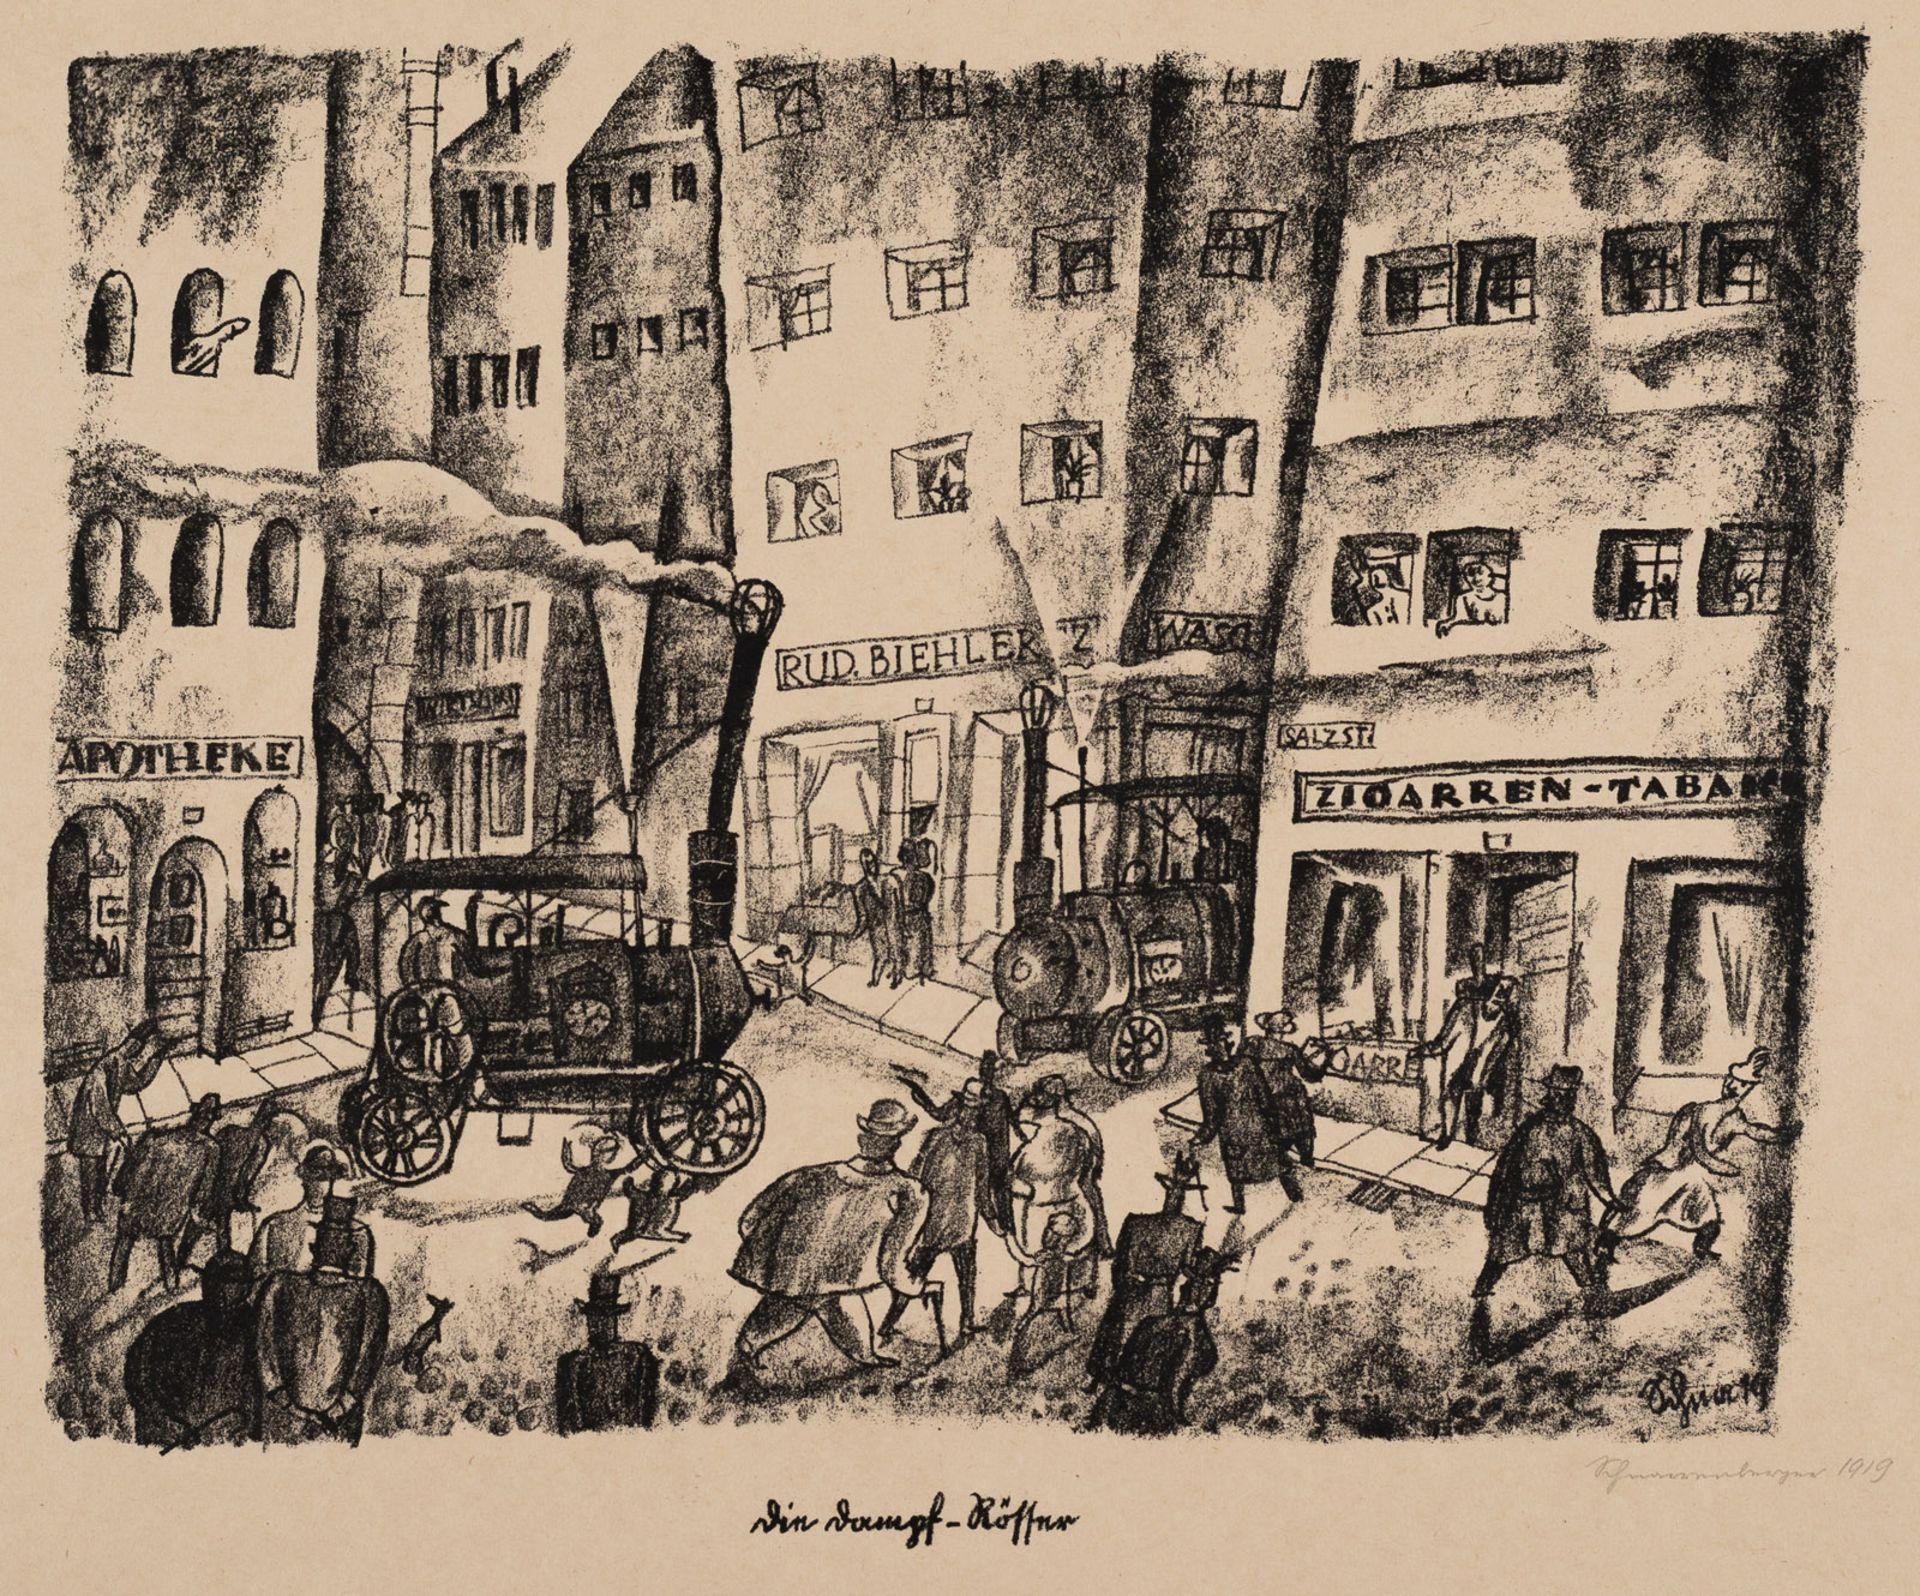 Schnarrenberger, Wilhelm - Image 4 of 4